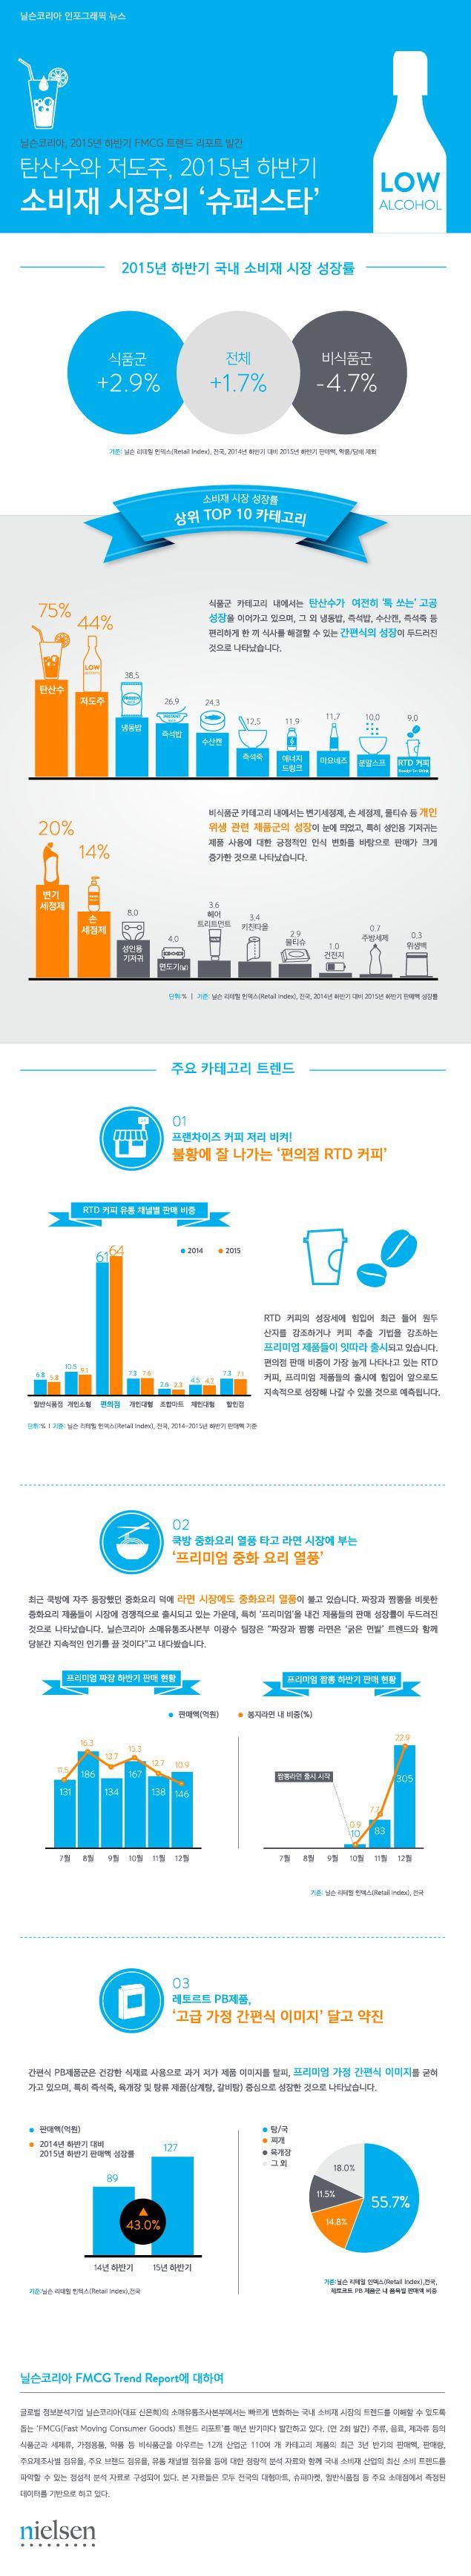 [Nielsen Korea Infographic]  2015년 하반기 'FMCG 트렌드 리포트' 발간  #infographic #fmcg #닐슨코리아 #인포그래픽 #리포트 #소비재트렌드